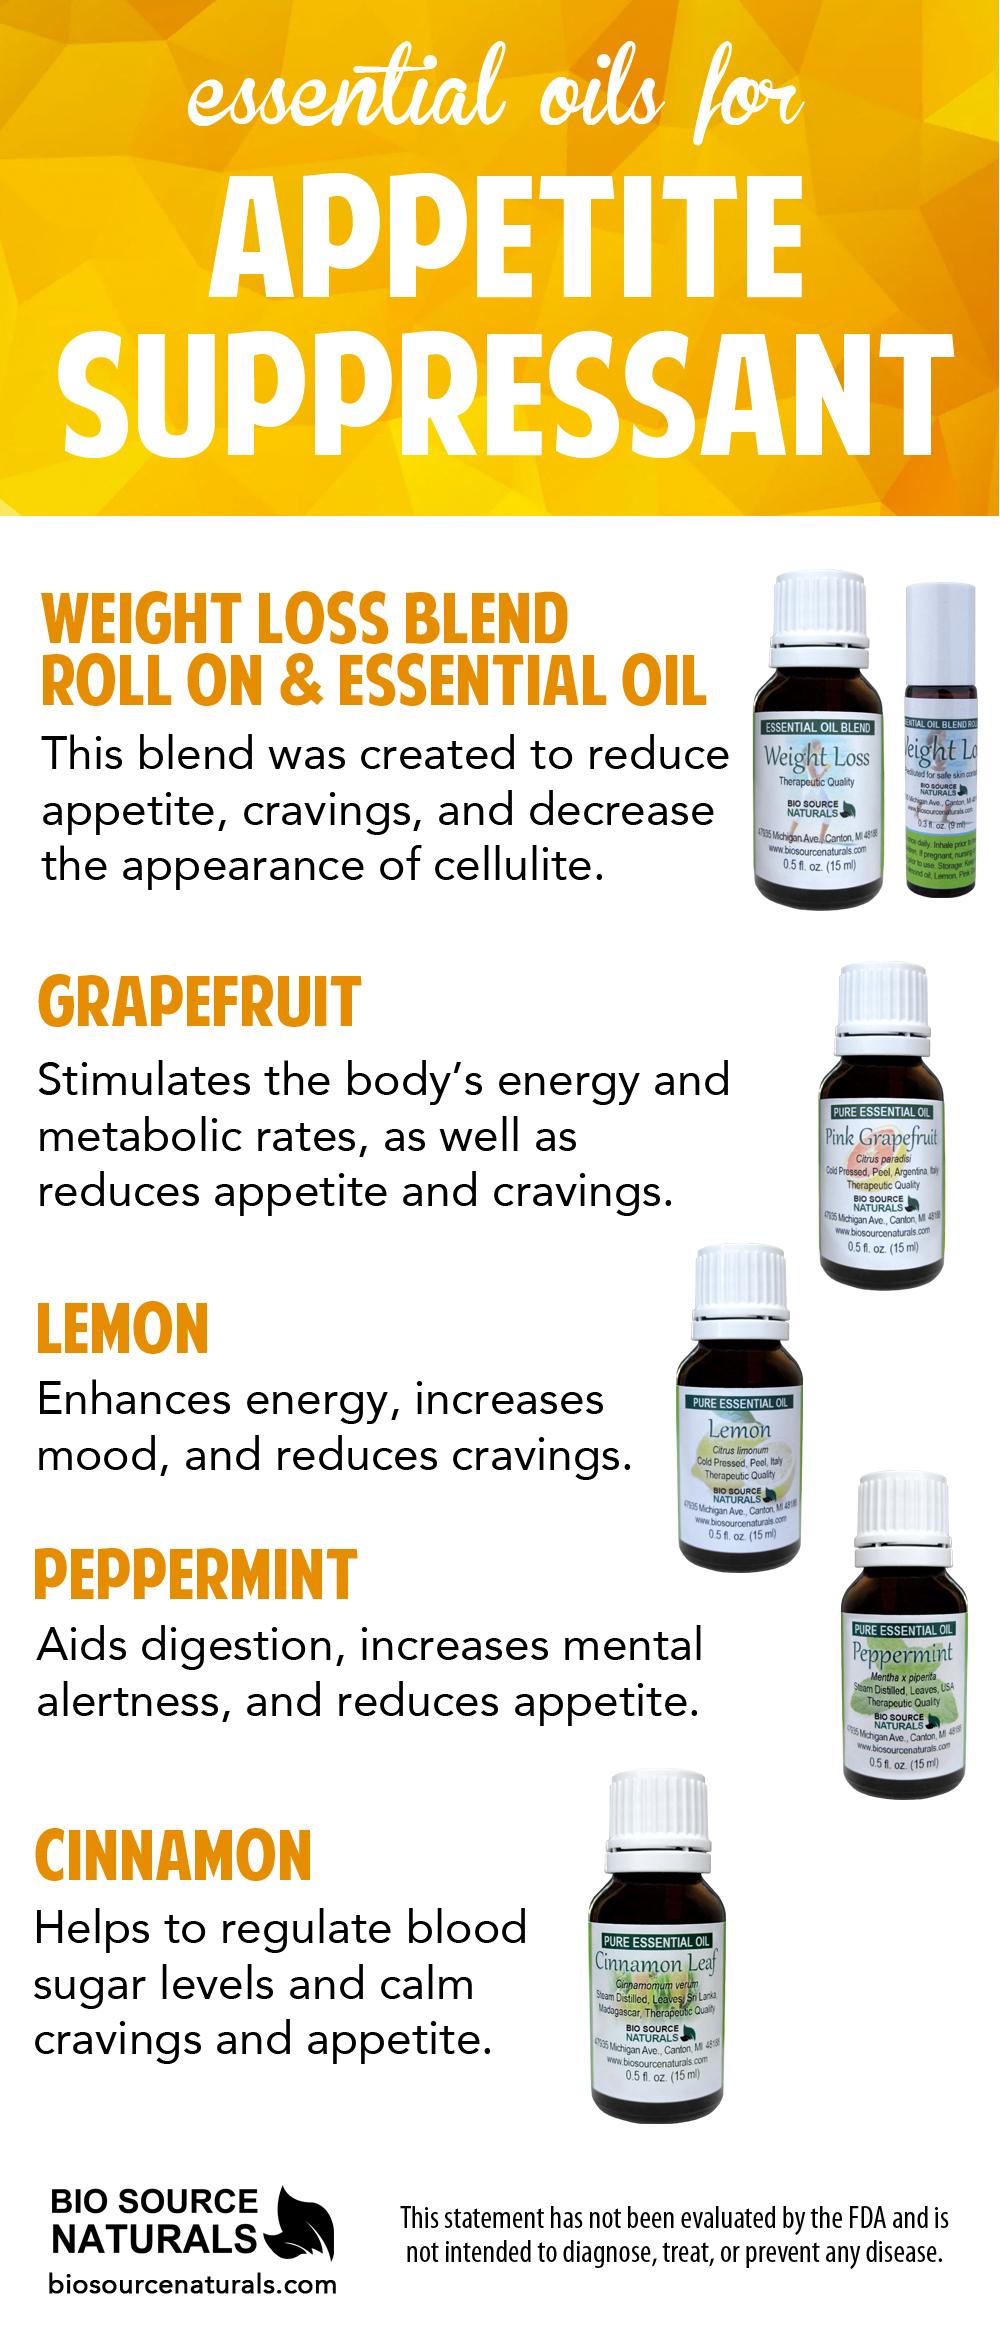 Lemon Pure Essential Oil